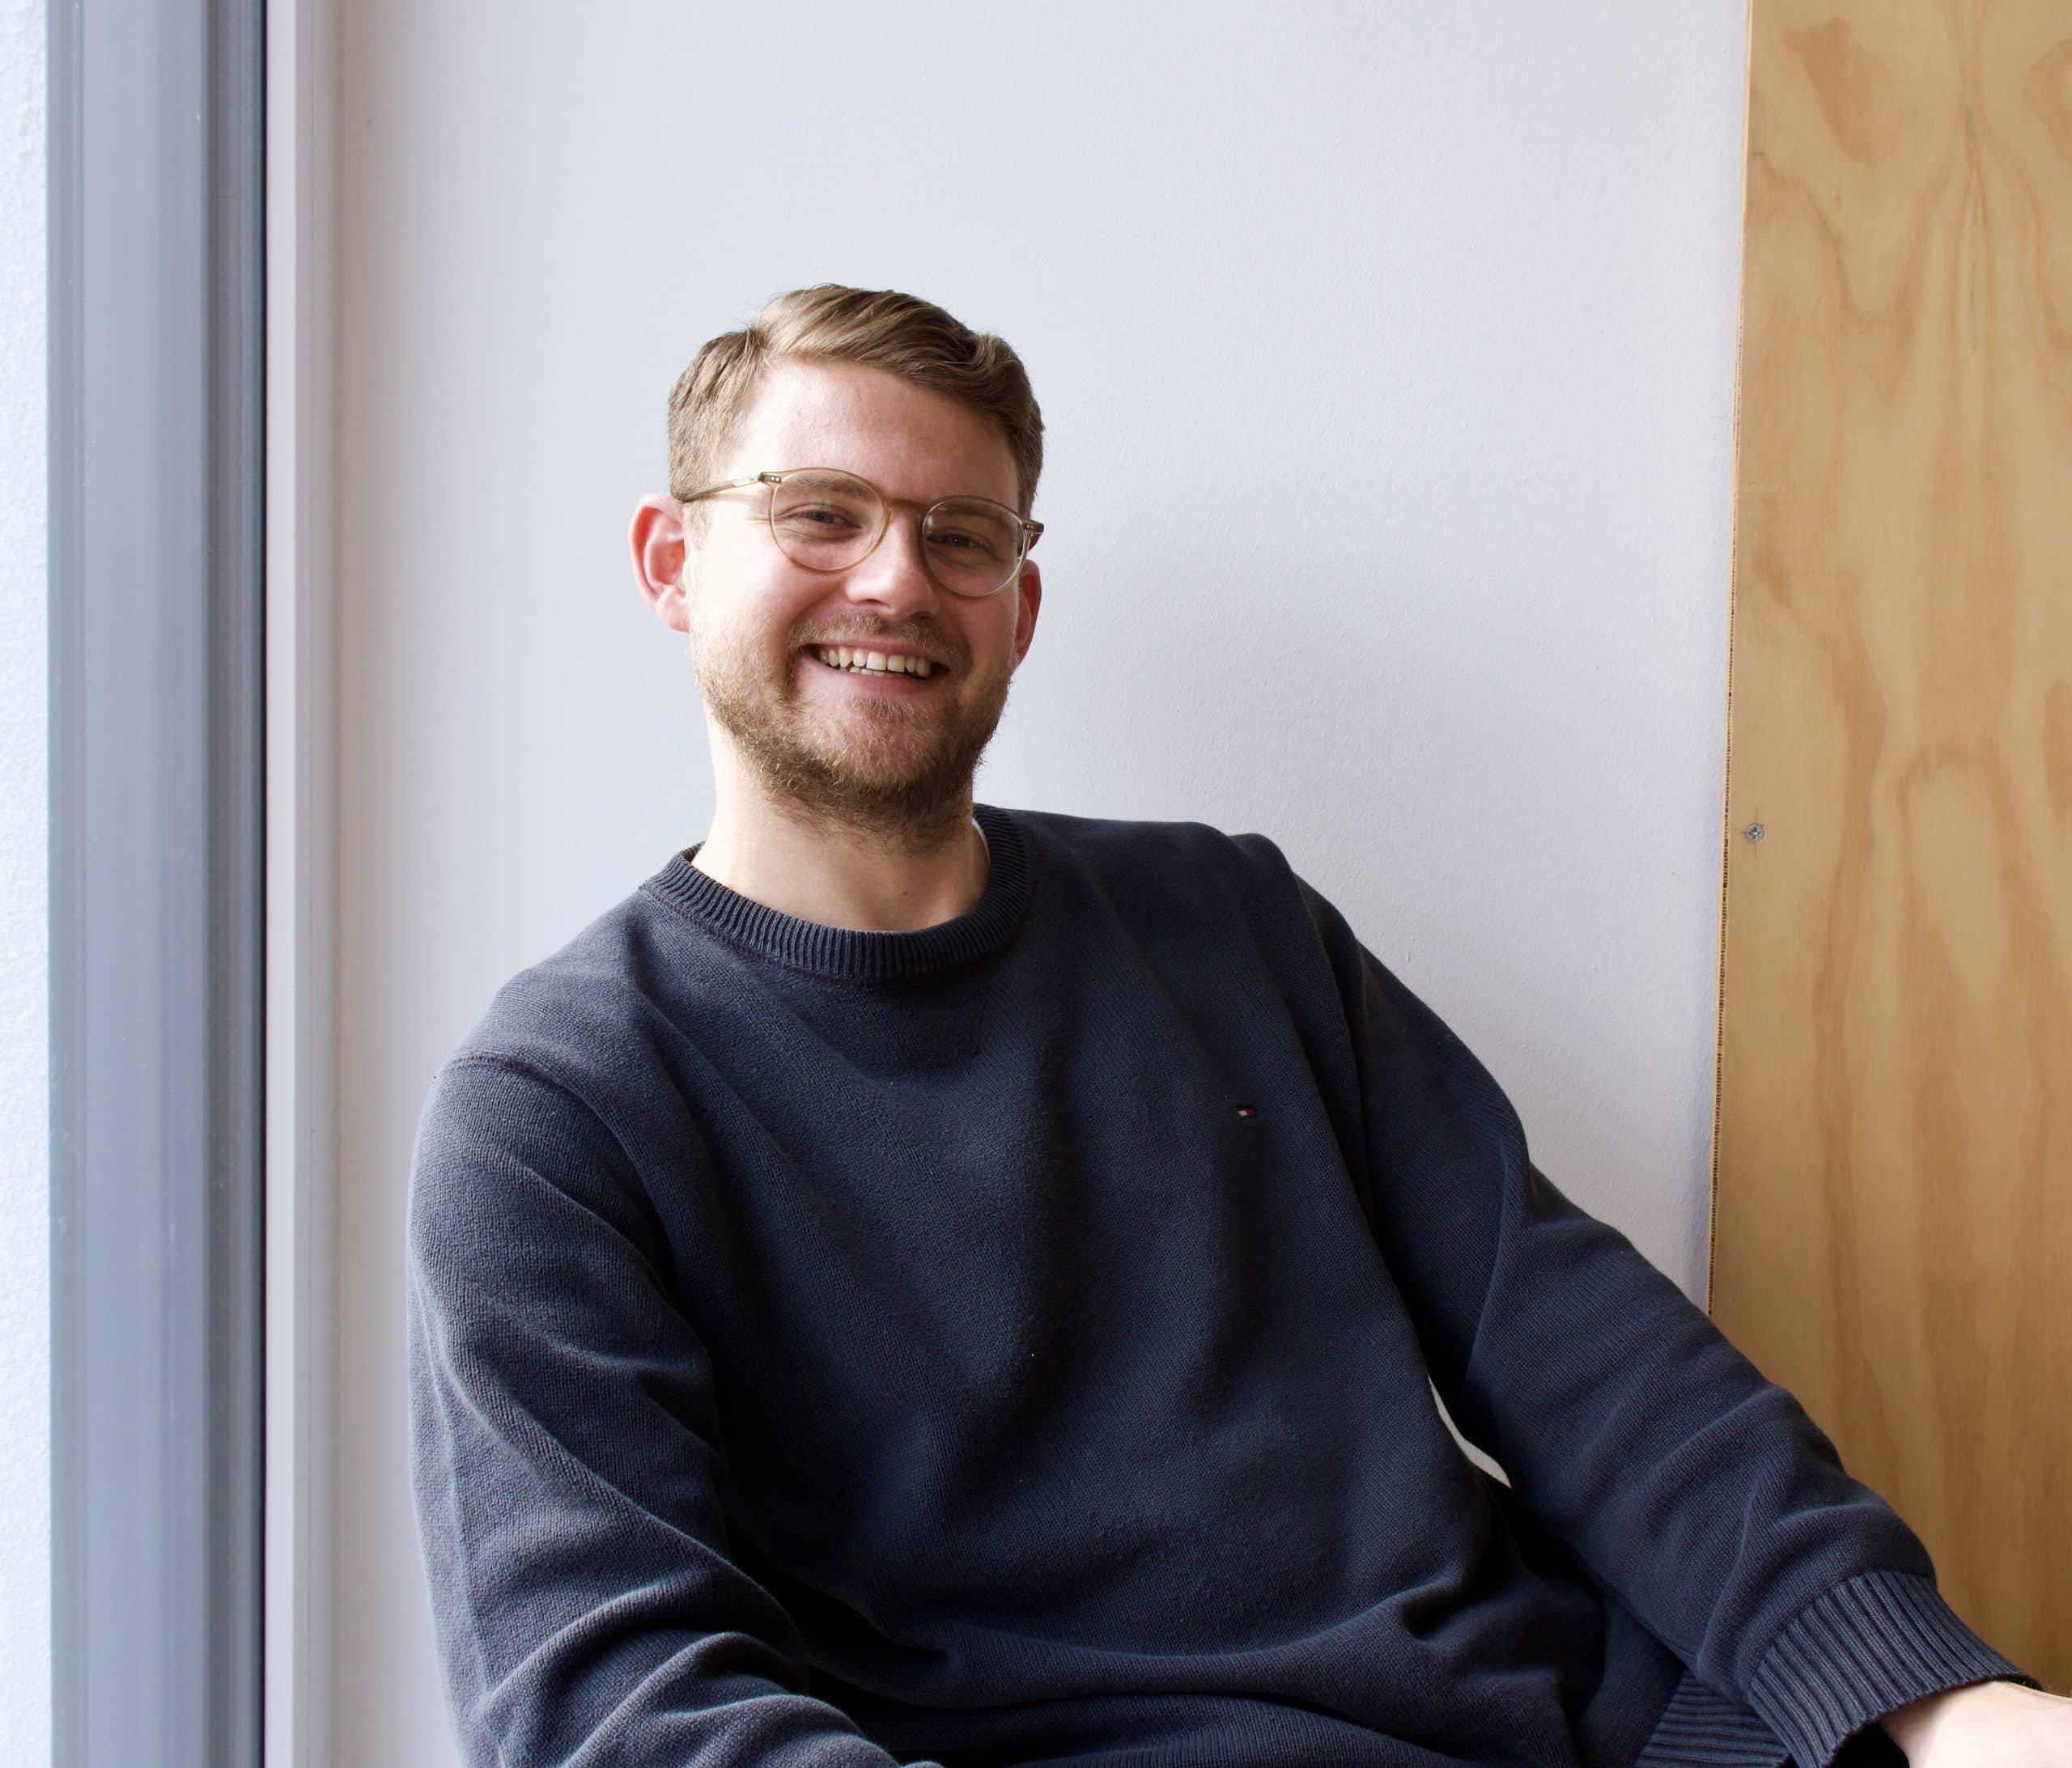 Theologiestudent Philipp